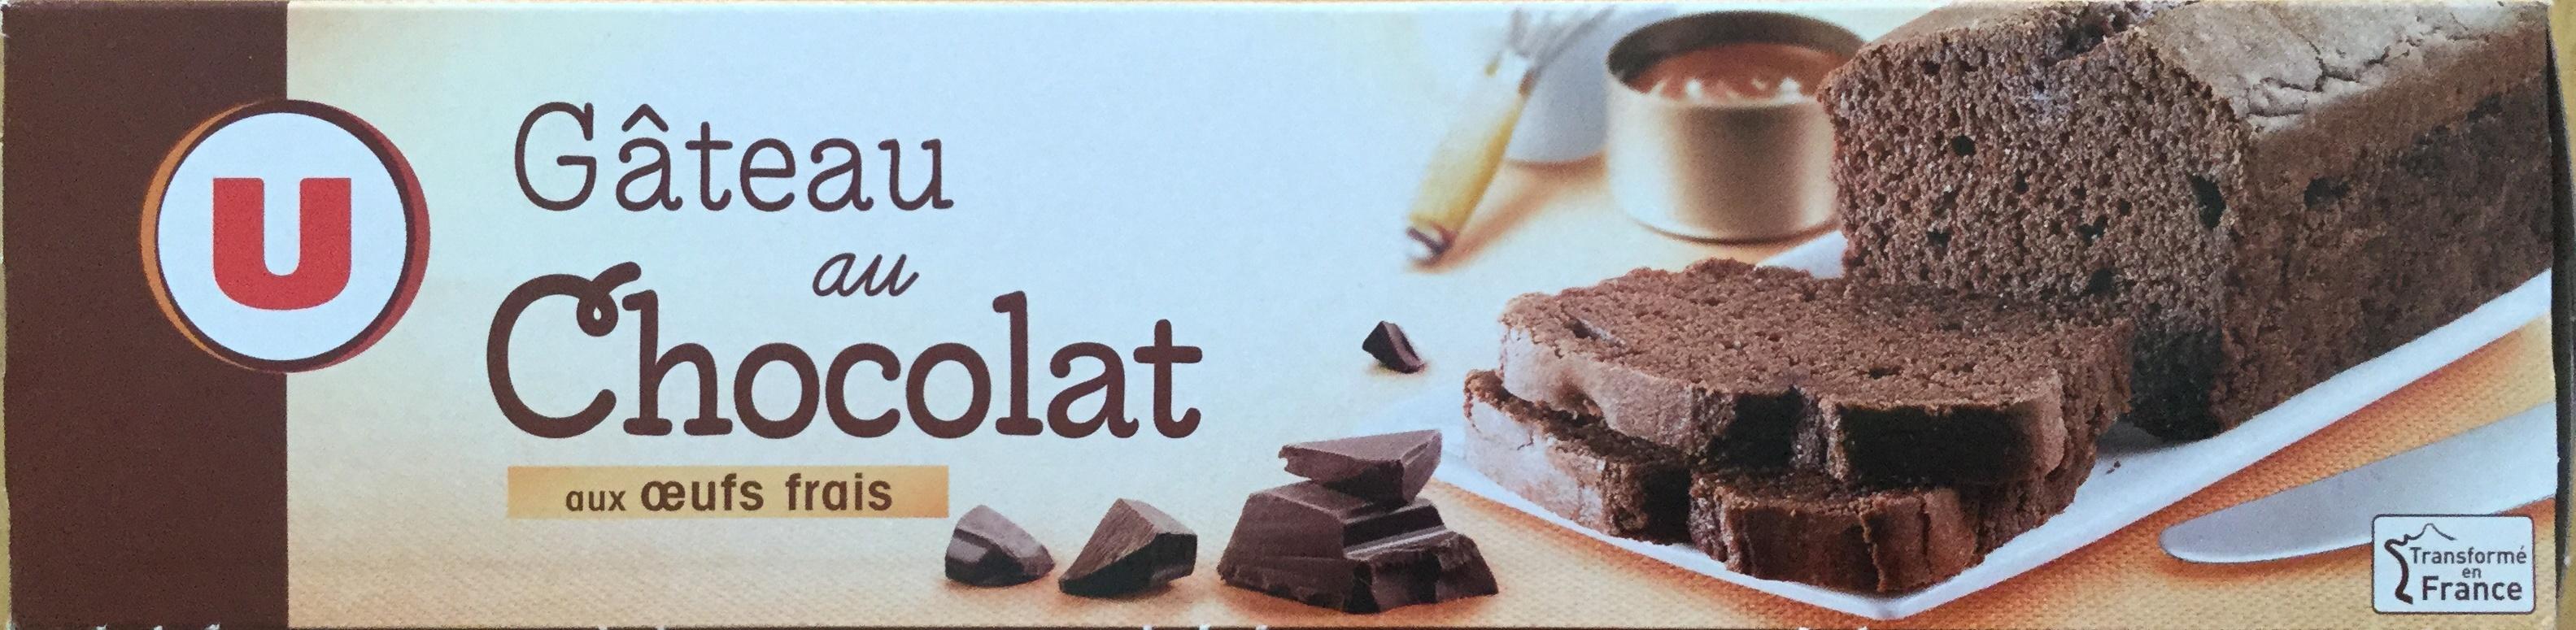 Gâteau au chocolat - Produit